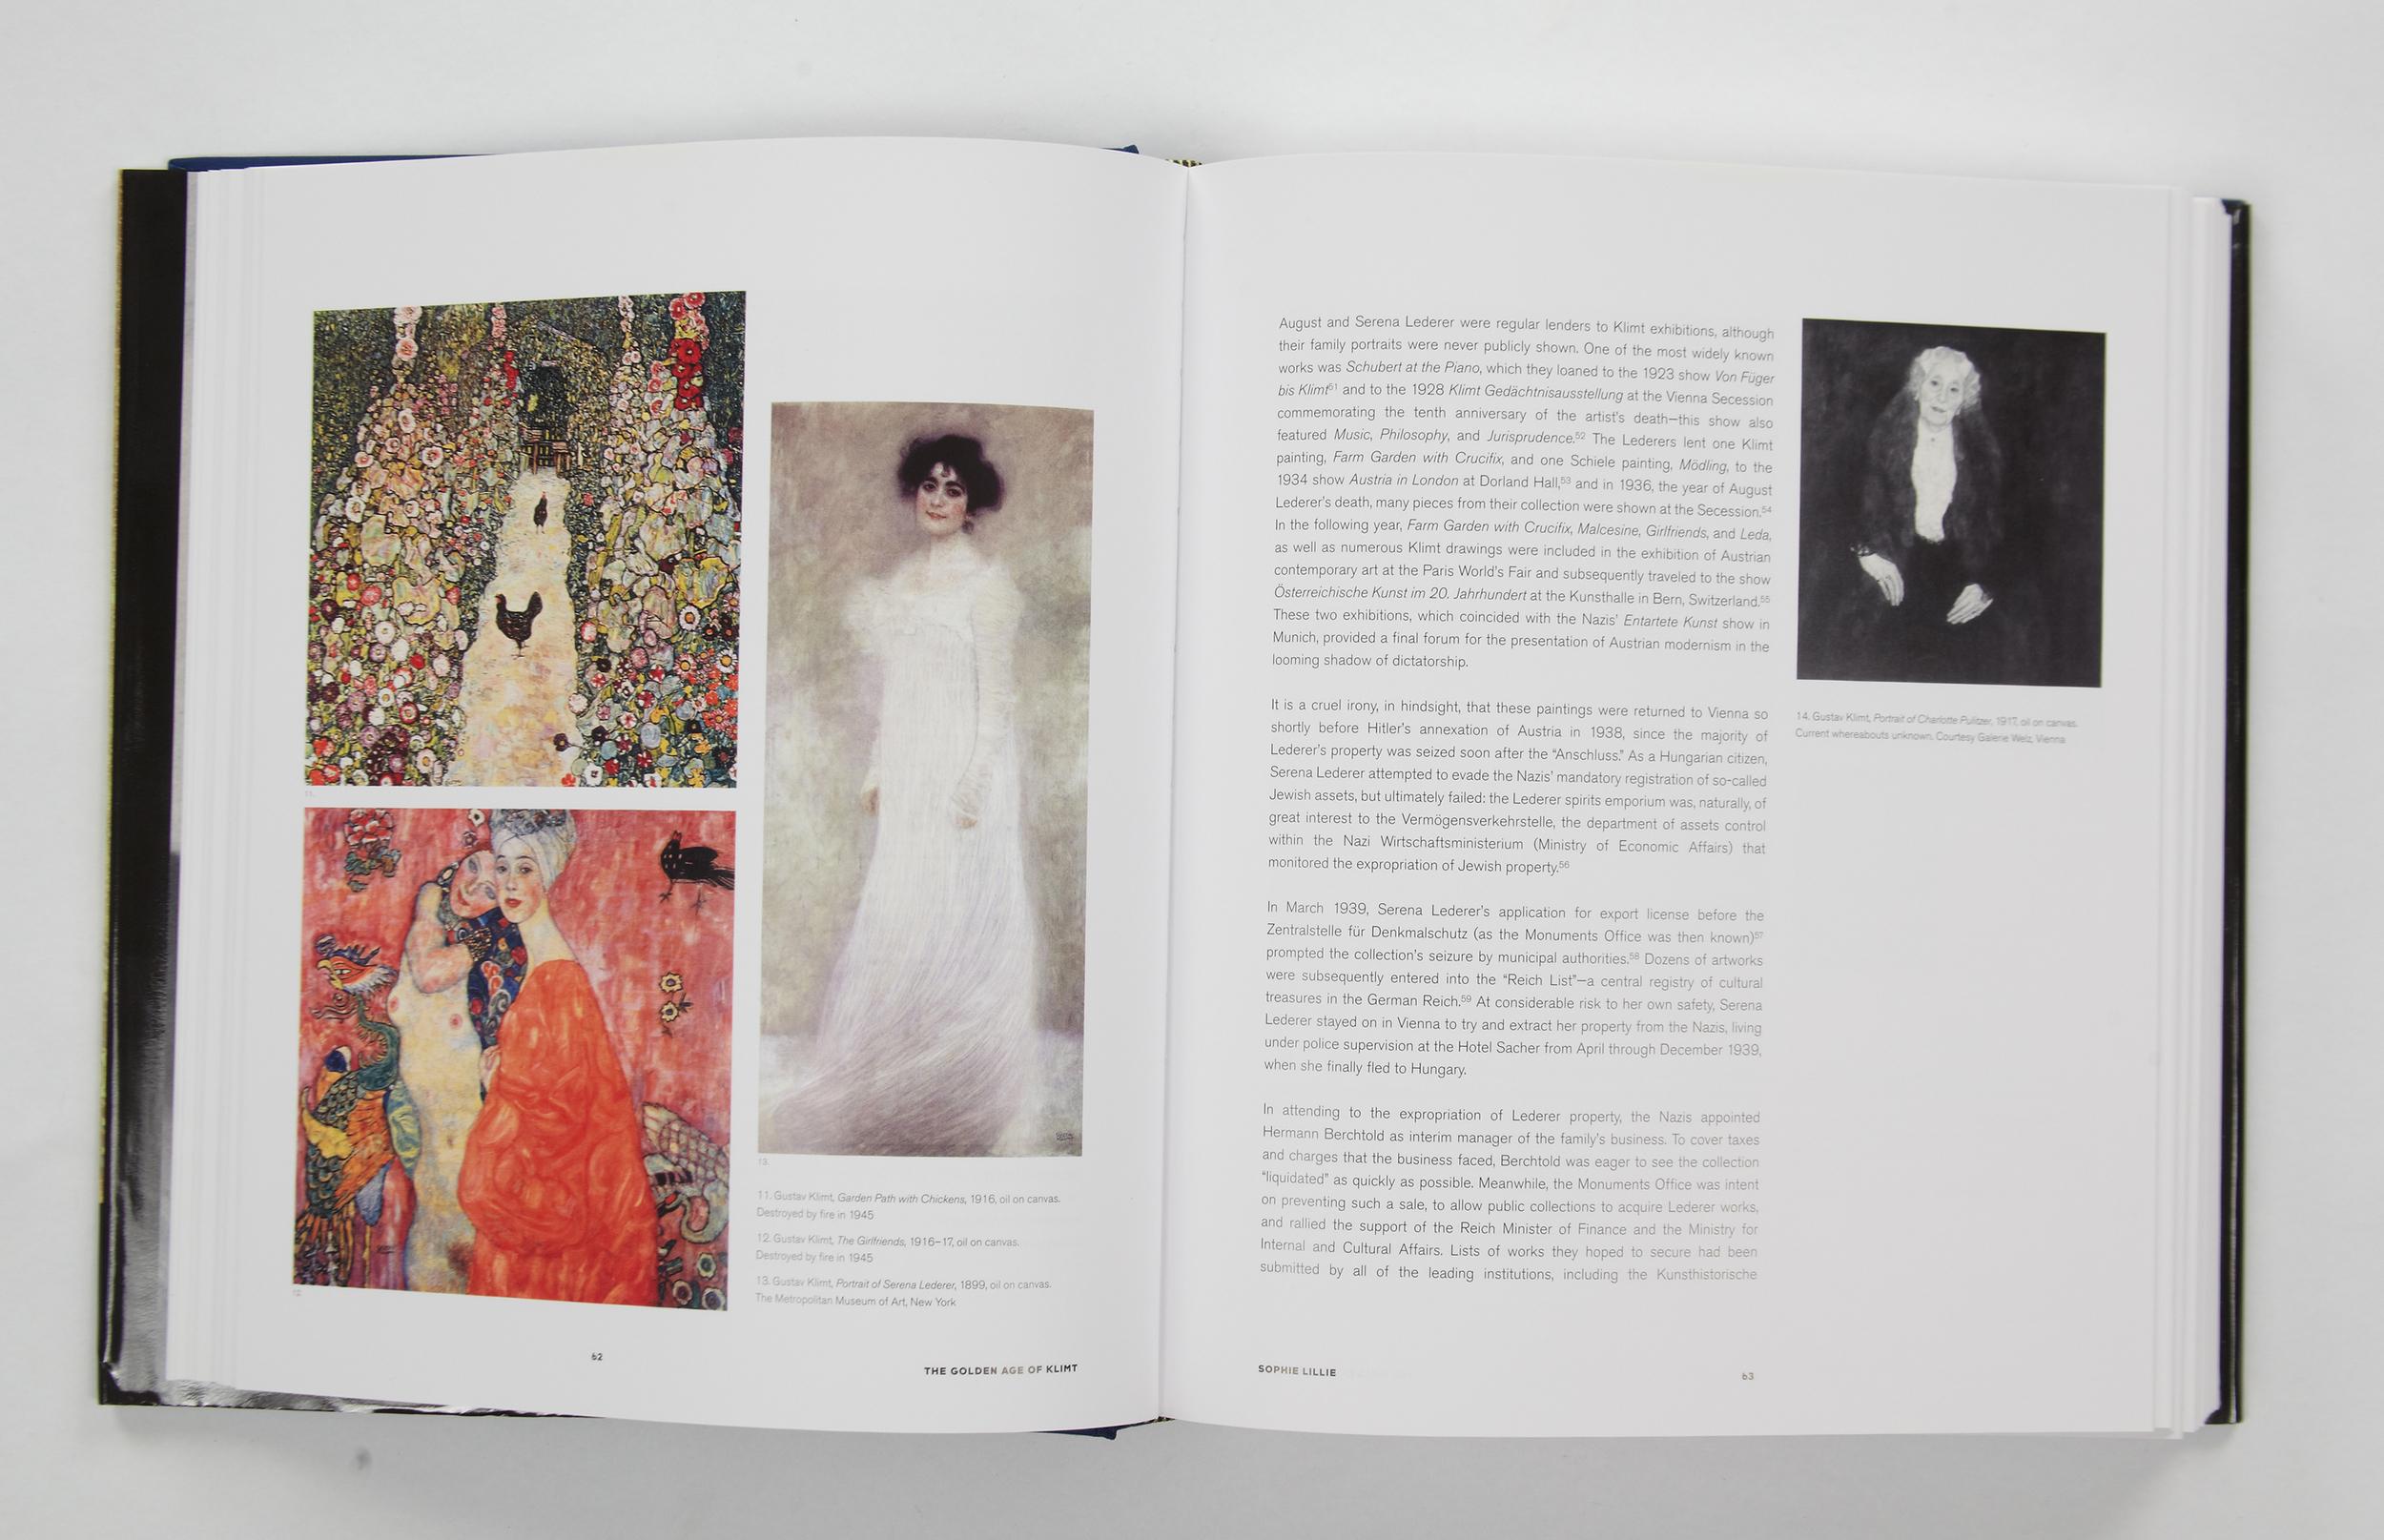 MG_Klimt_bookpost__0006_TSE_Invitations__568.jpg.jpg